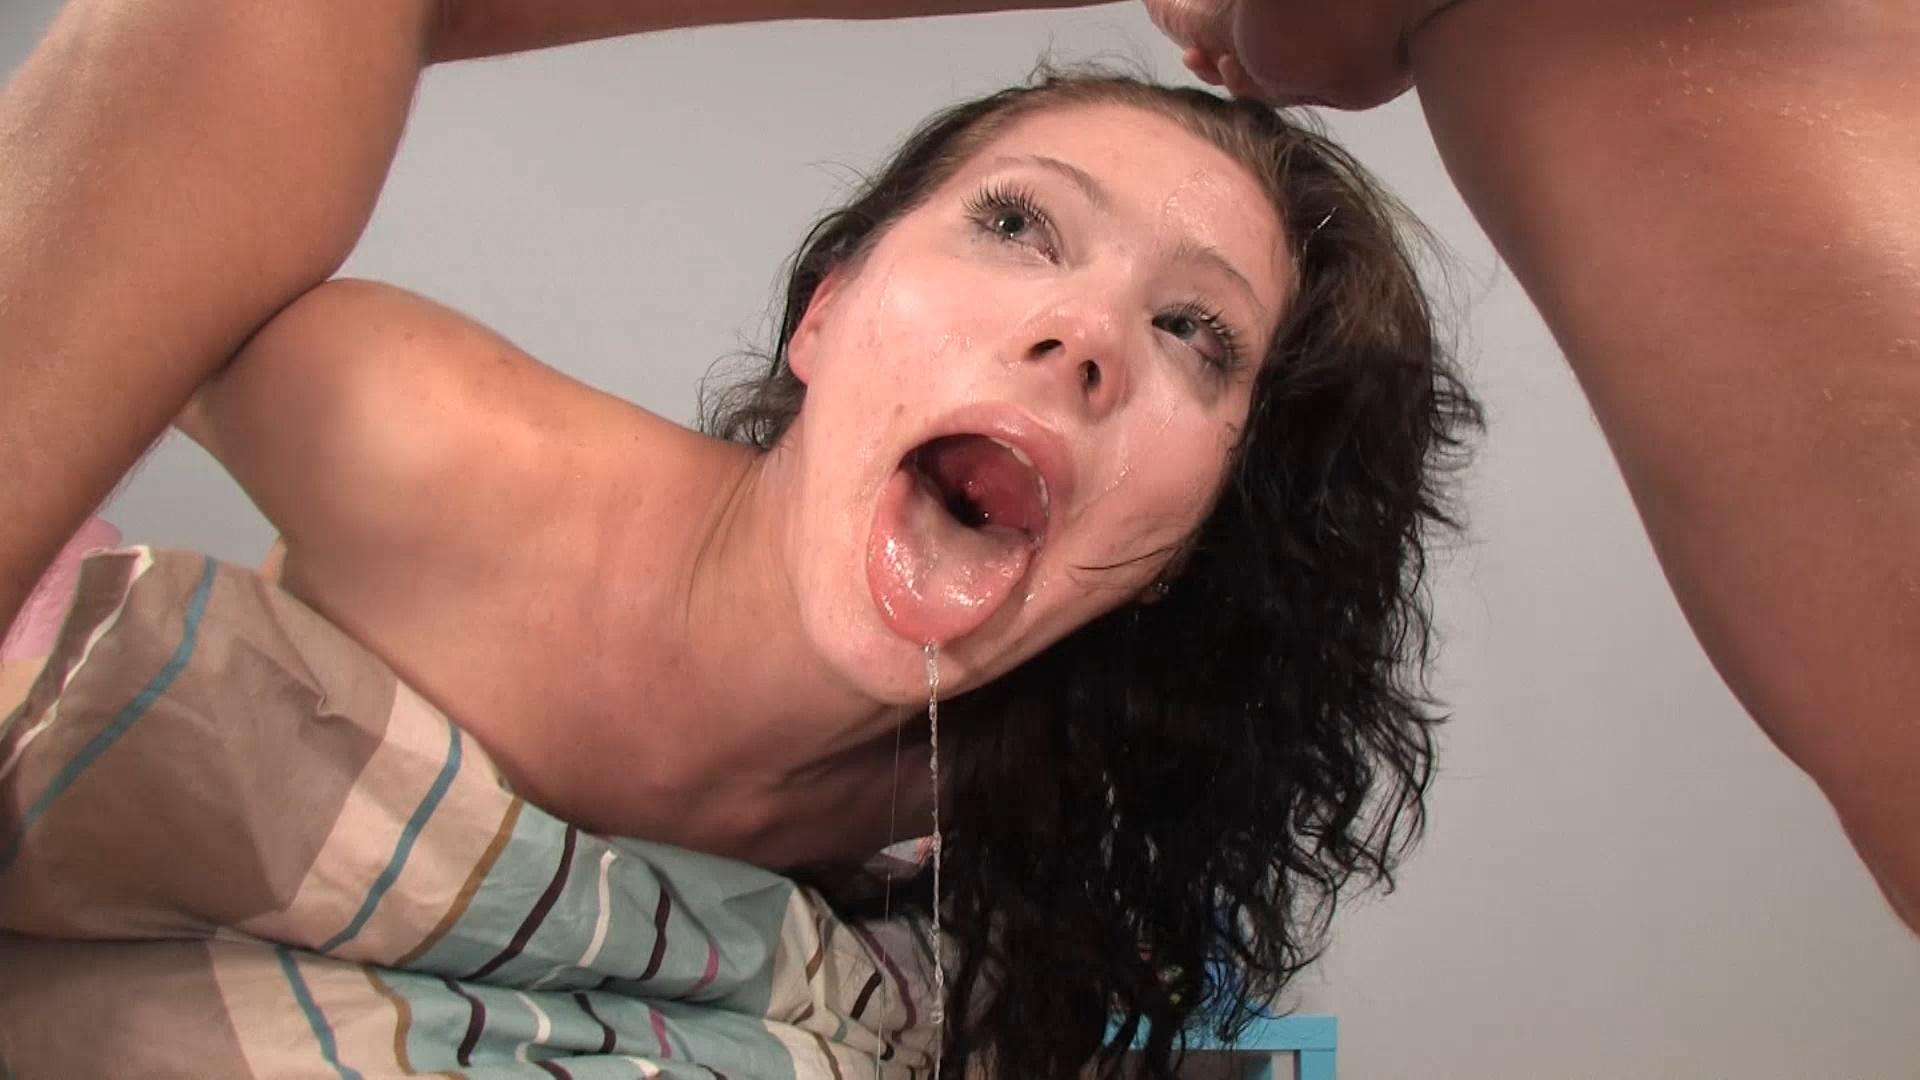 Brutal deep throat, porn